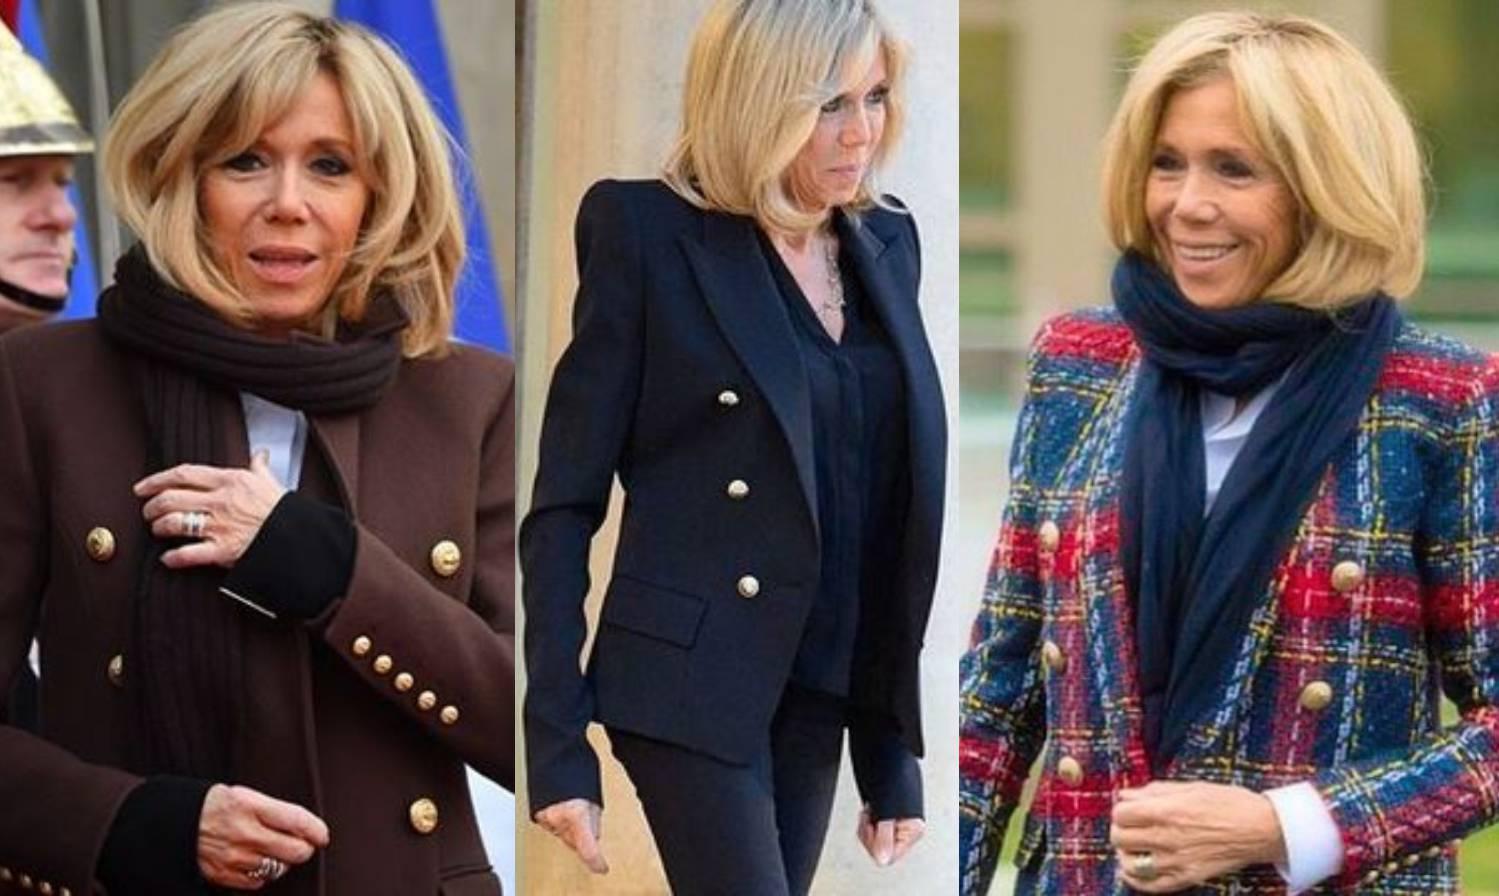 Chic klasika: Brigitte Macron ima izvrsne sakoe navy stila